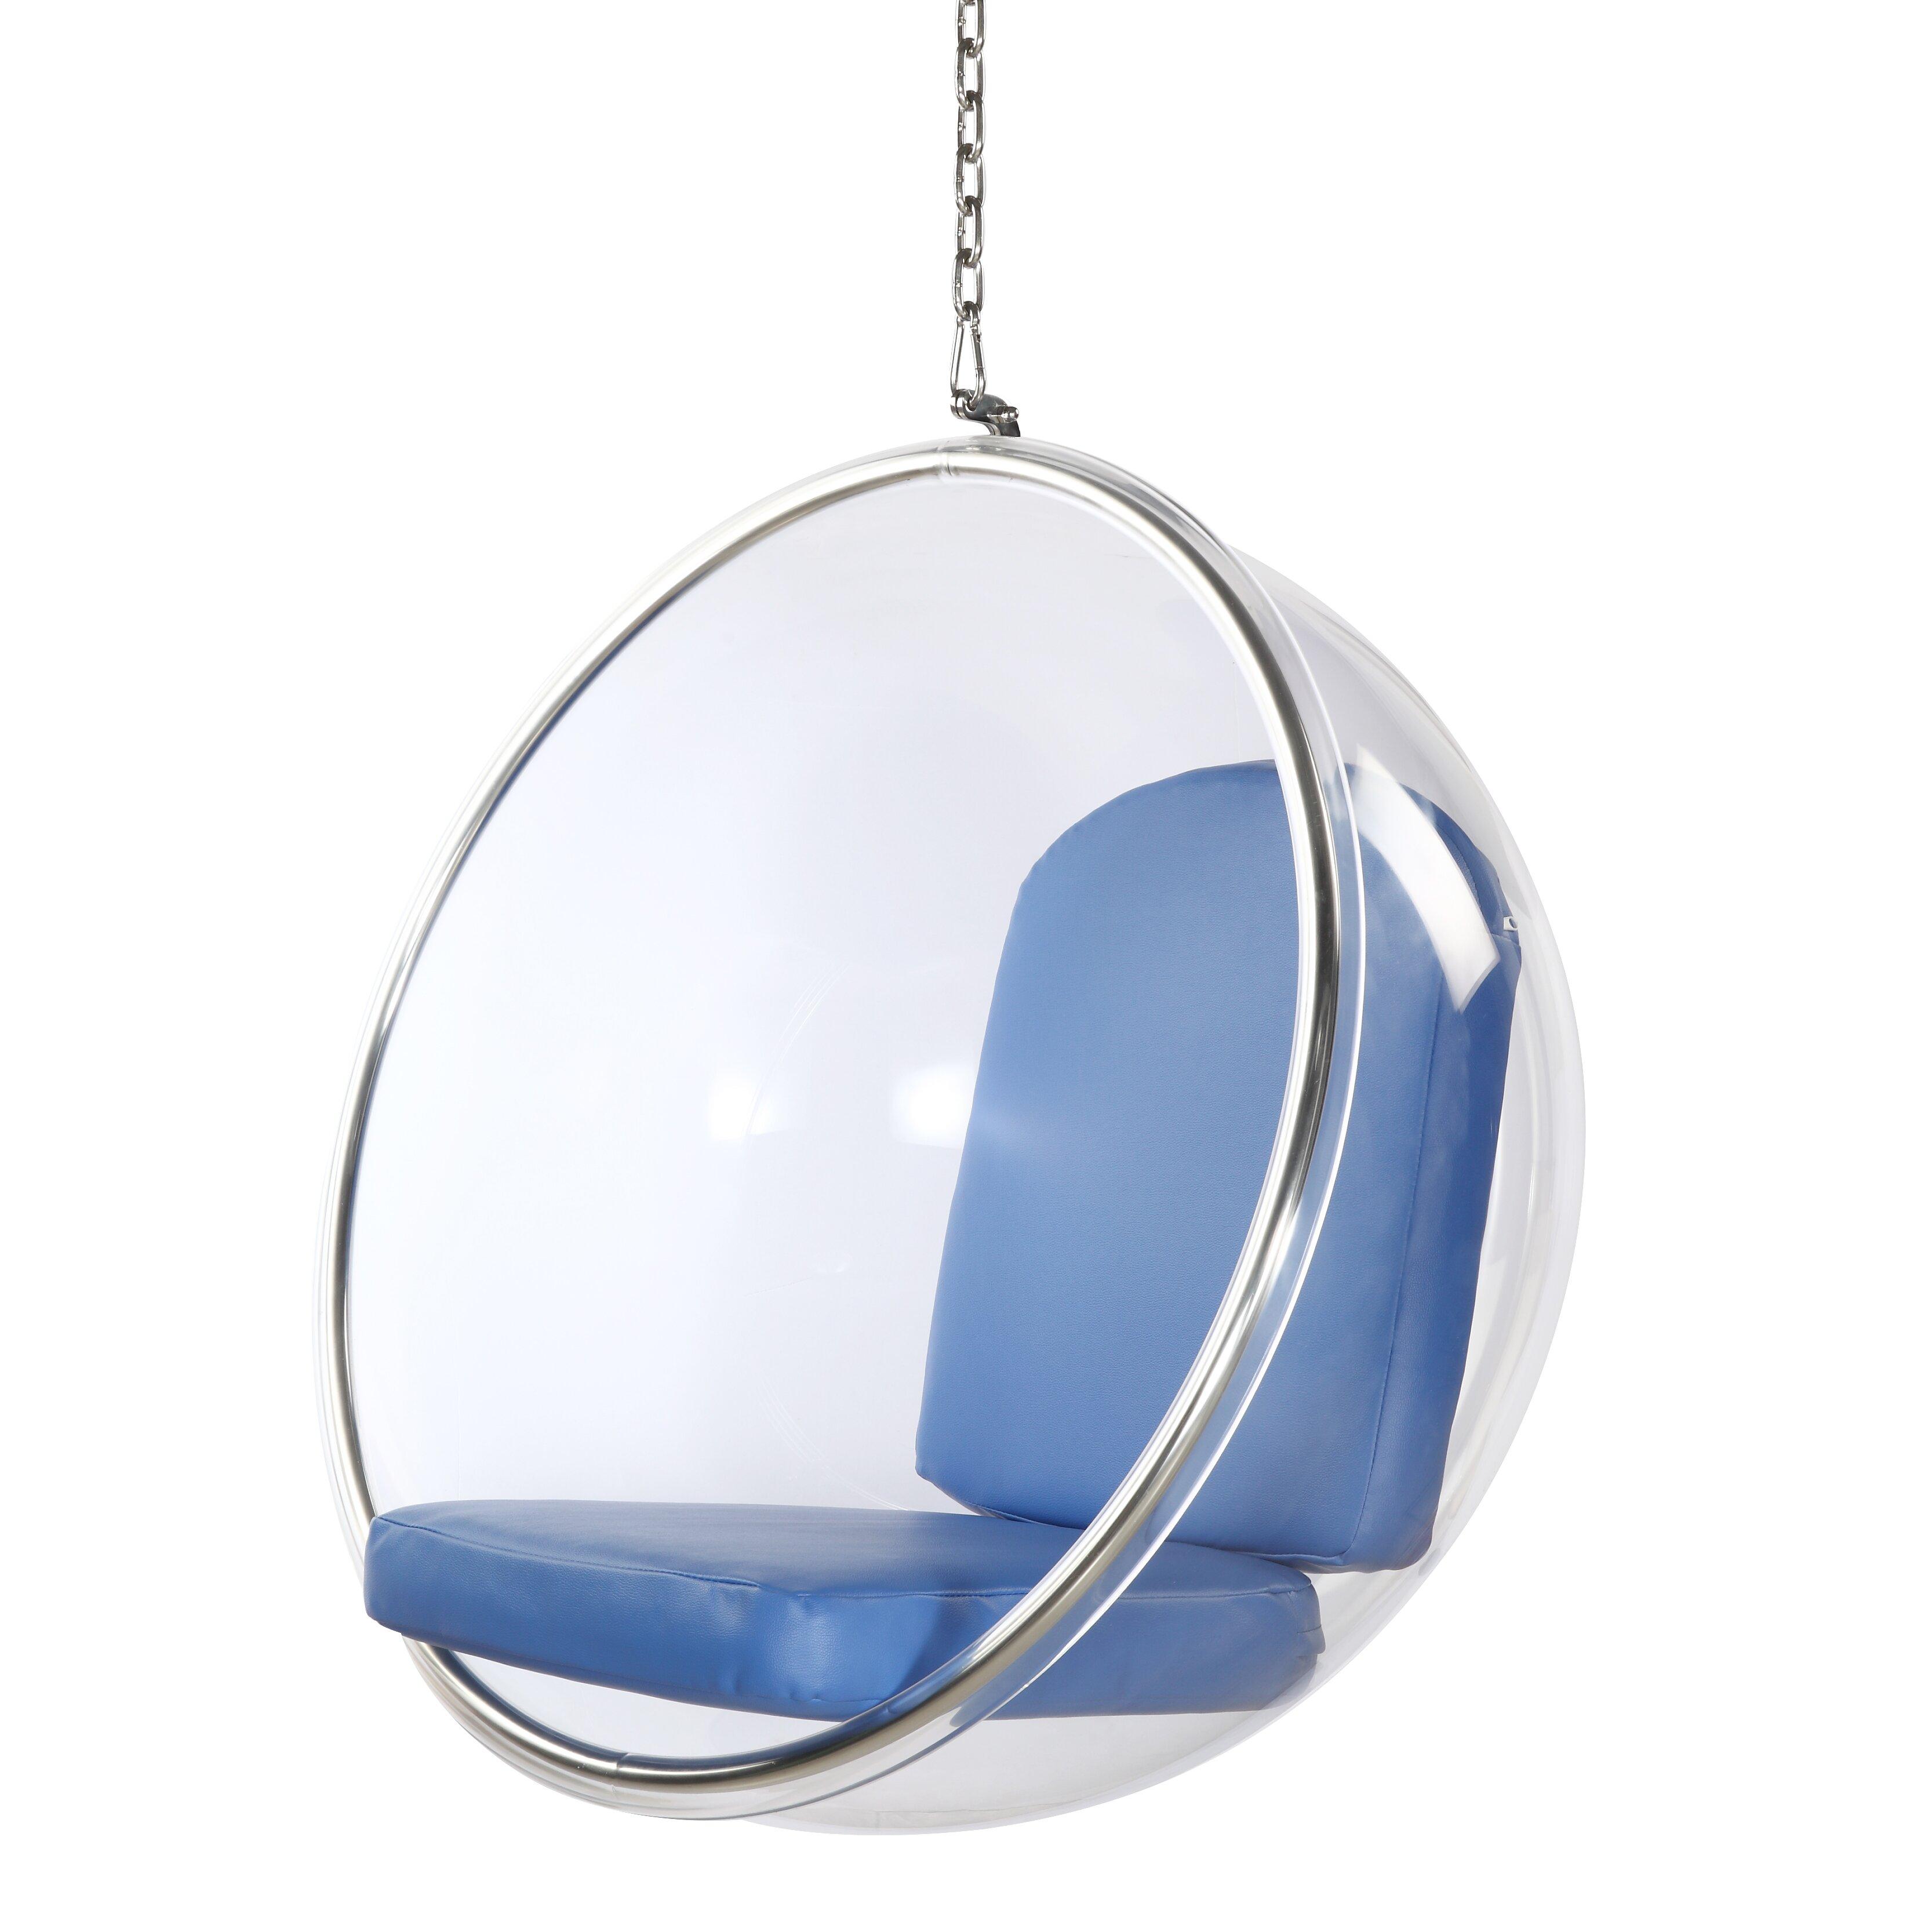 fine mod imports bubble lounge chair reviews wayfair. Black Bedroom Furniture Sets. Home Design Ideas